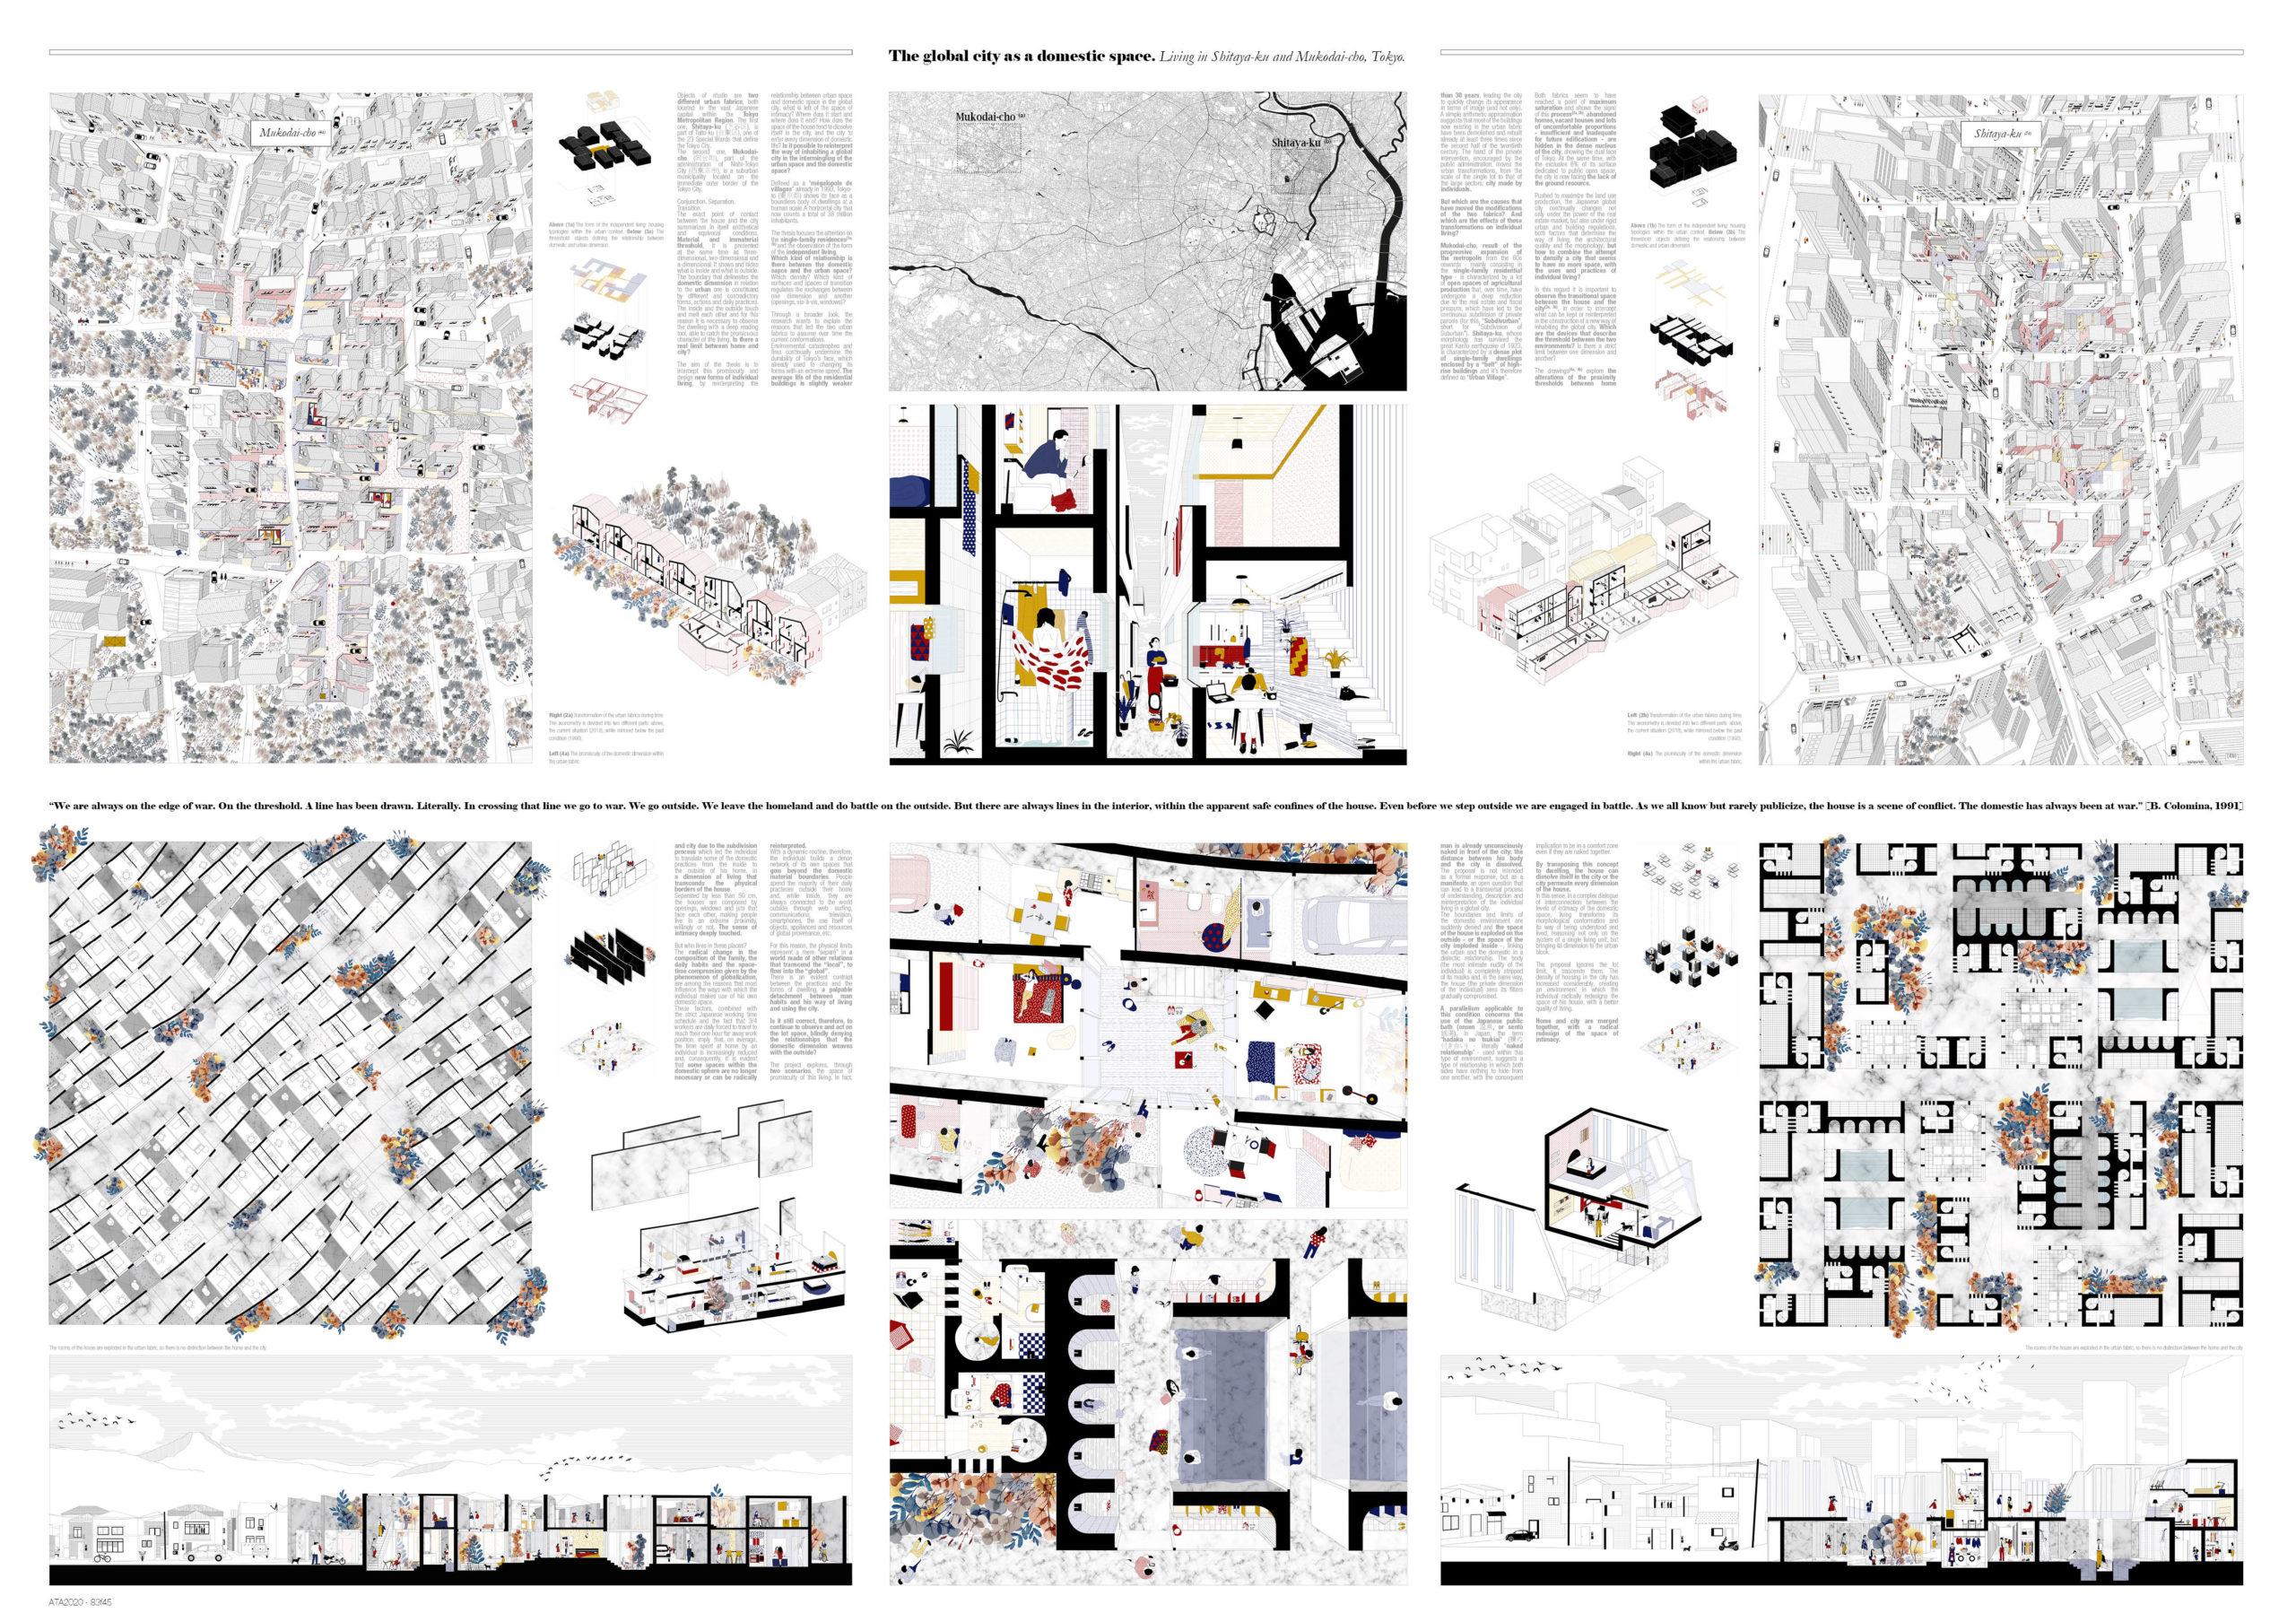 The global city as a domestic space. Living in Shitaya-ku and Mukodai-cho, Tokyo Board